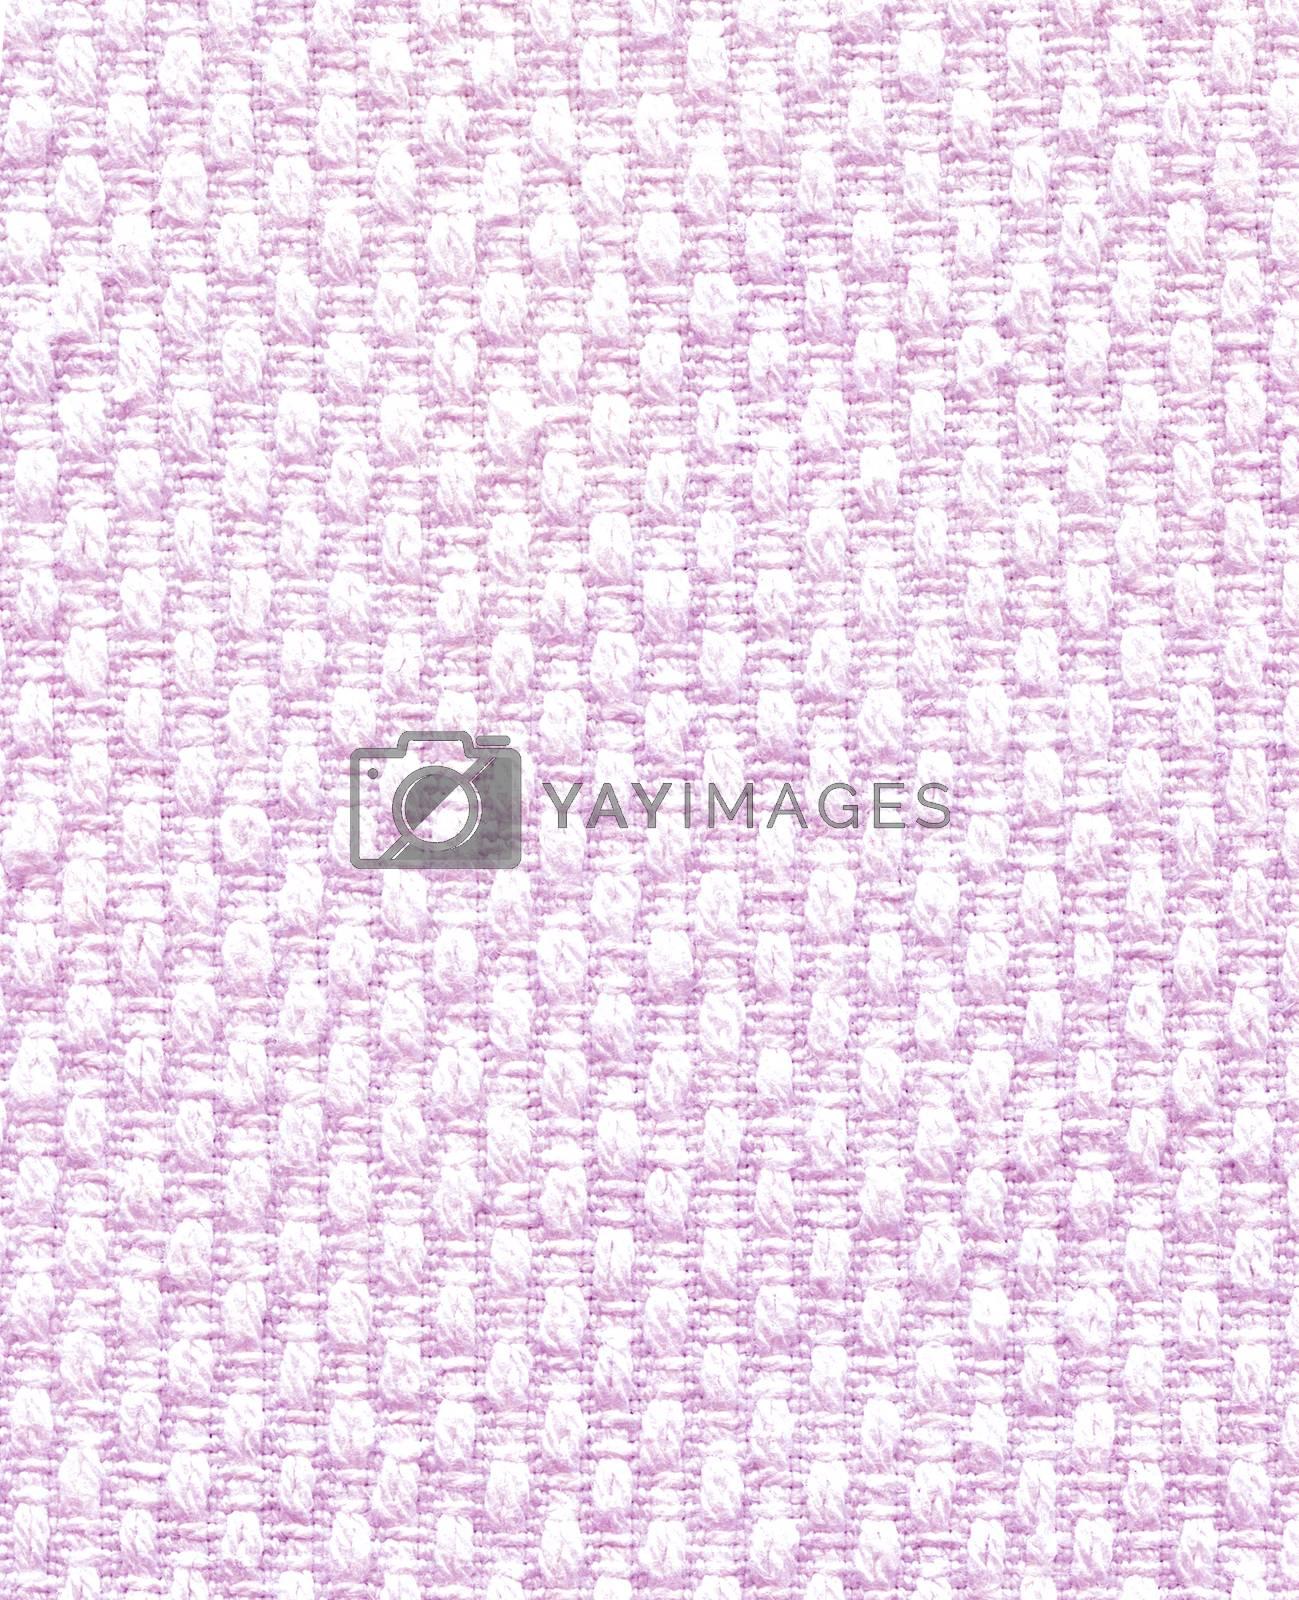 Fabric texture, soft light pattern by ESSL